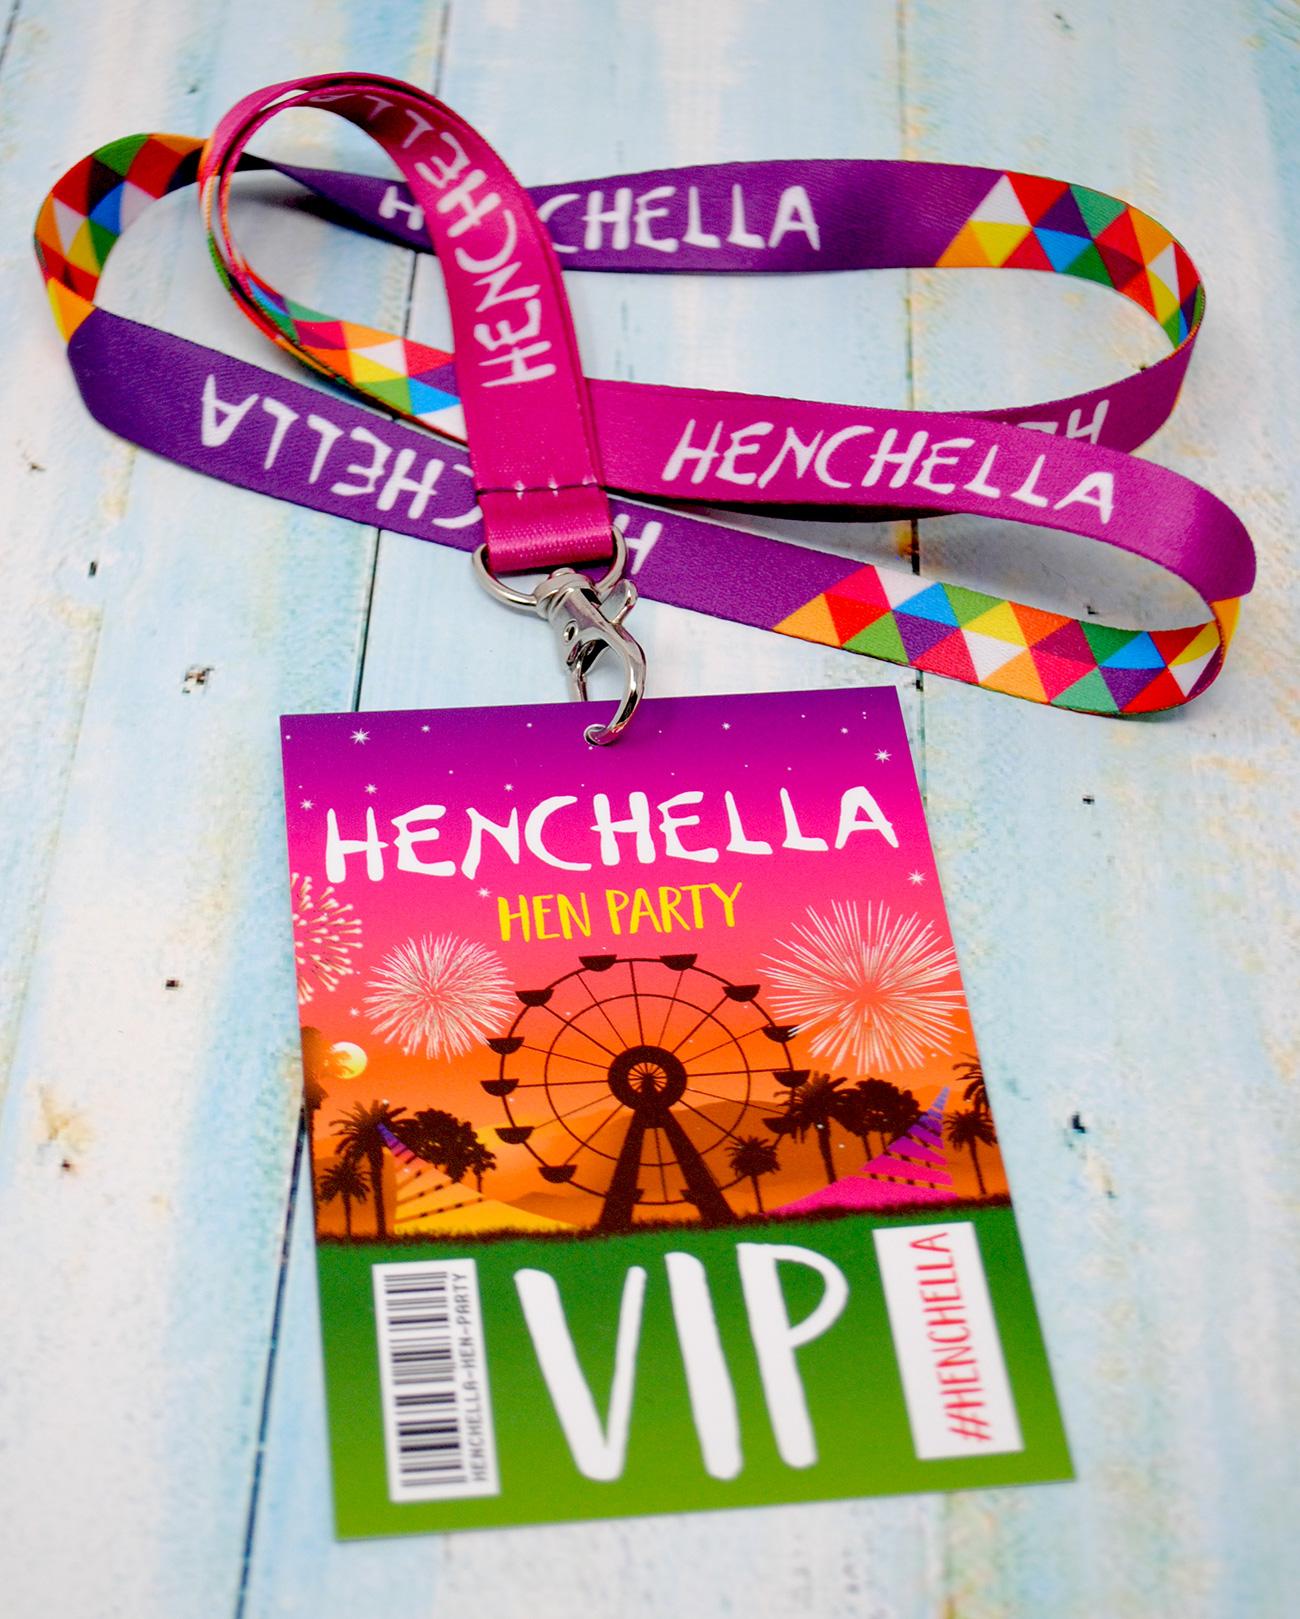 henchella festival hen party vip pass